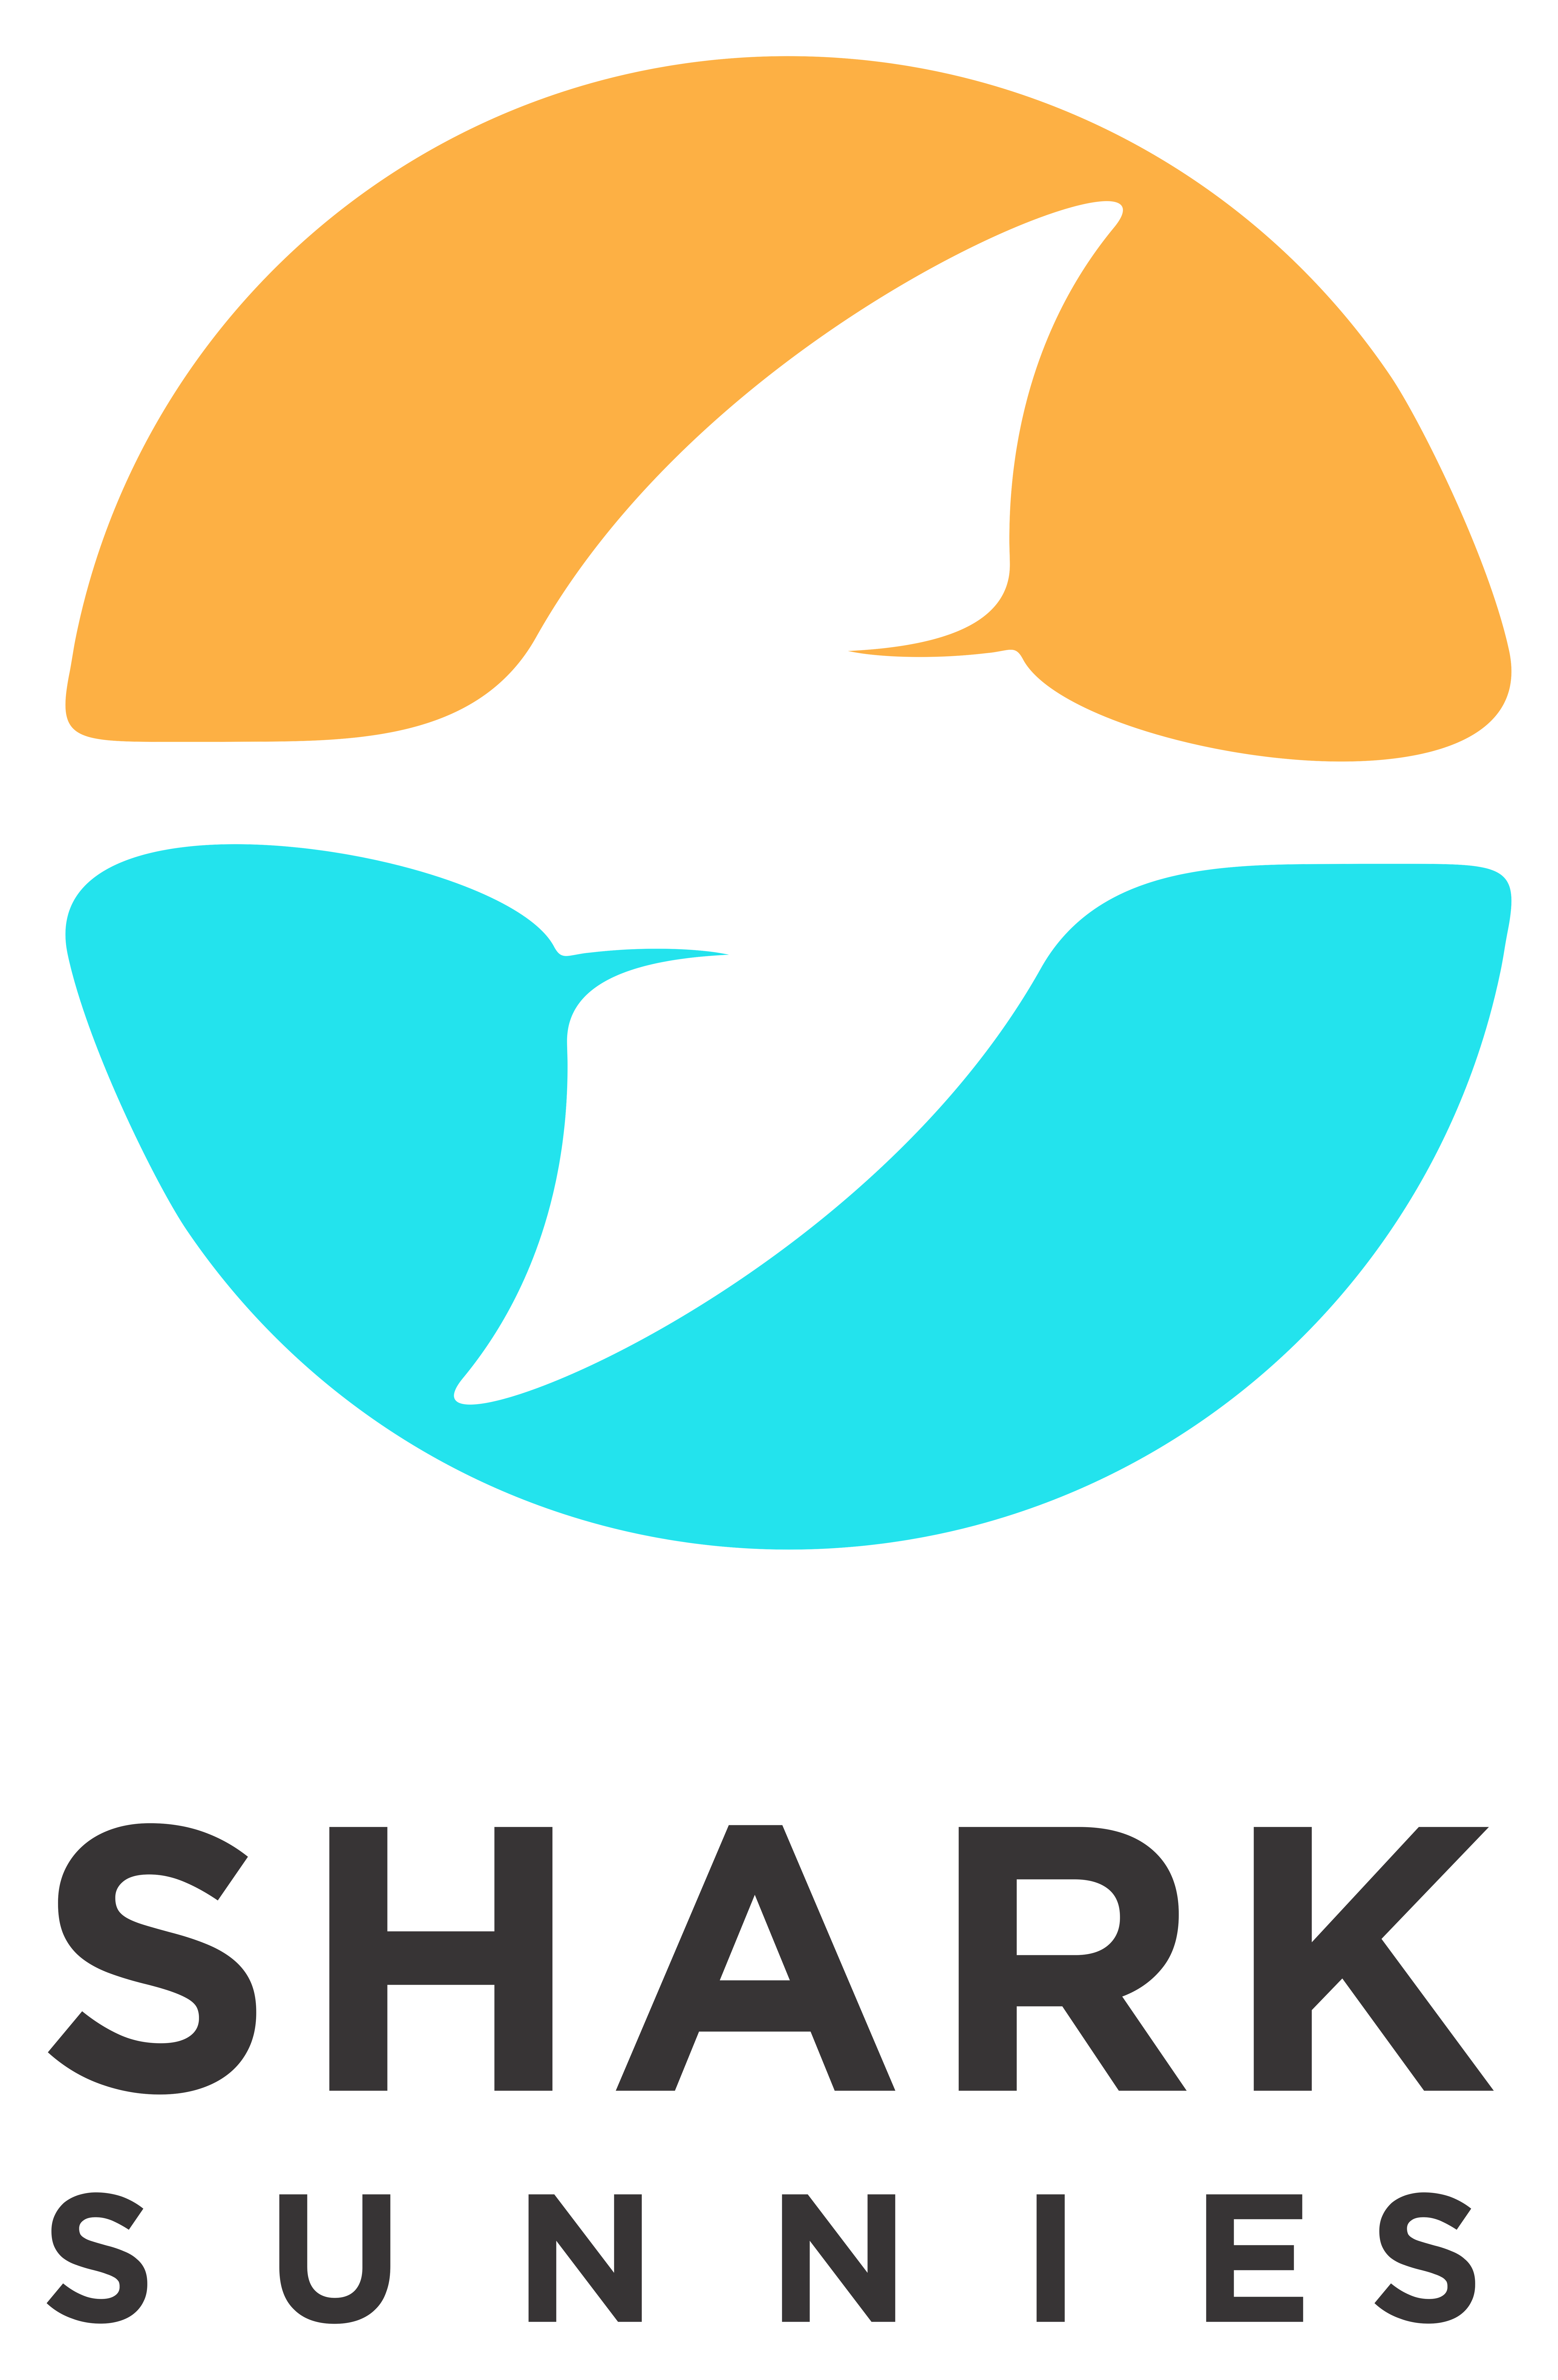 Design a sharp shark logo for sunglasses